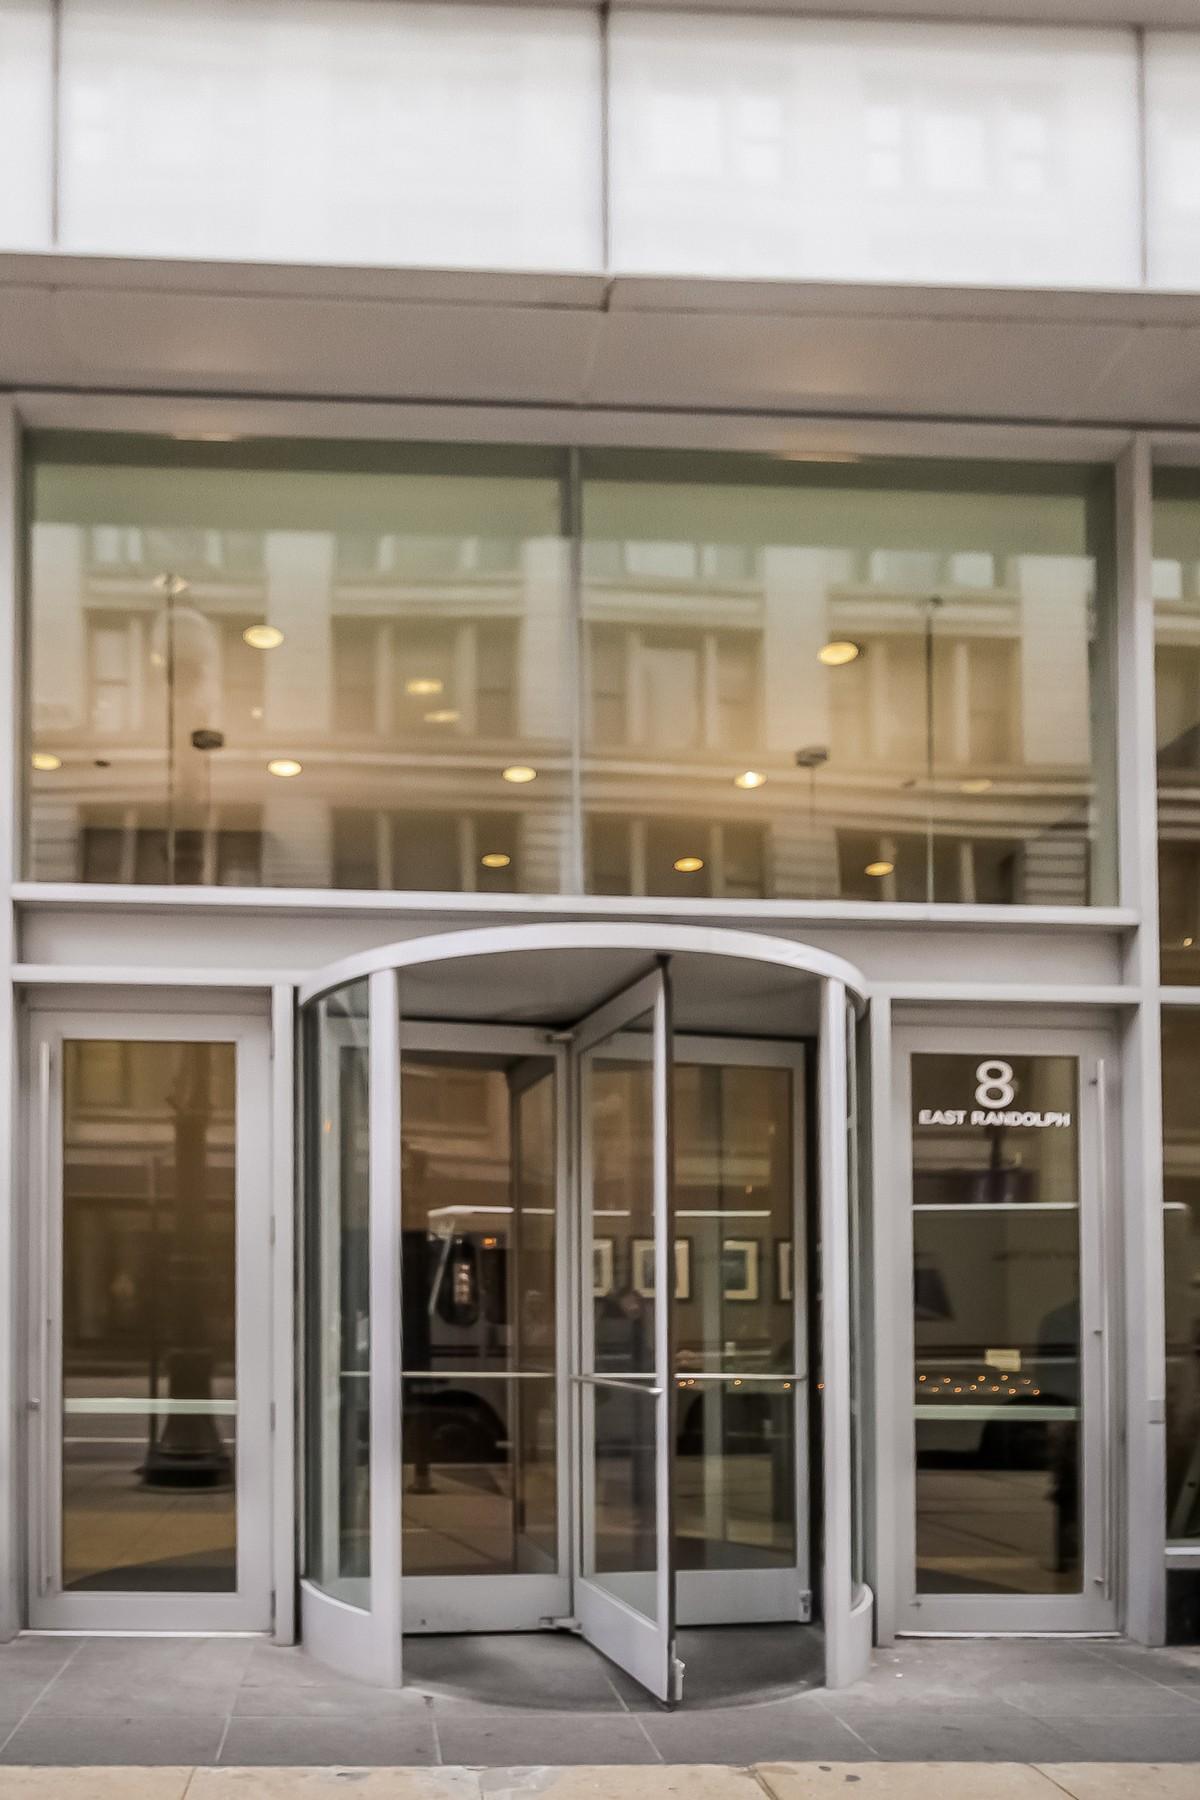 Condominium for Sale at Beautiful Joeffrey Tower Condo 8 E Randolph Street Unit 3001 Loop, Chicago, Illinois 60601 United States